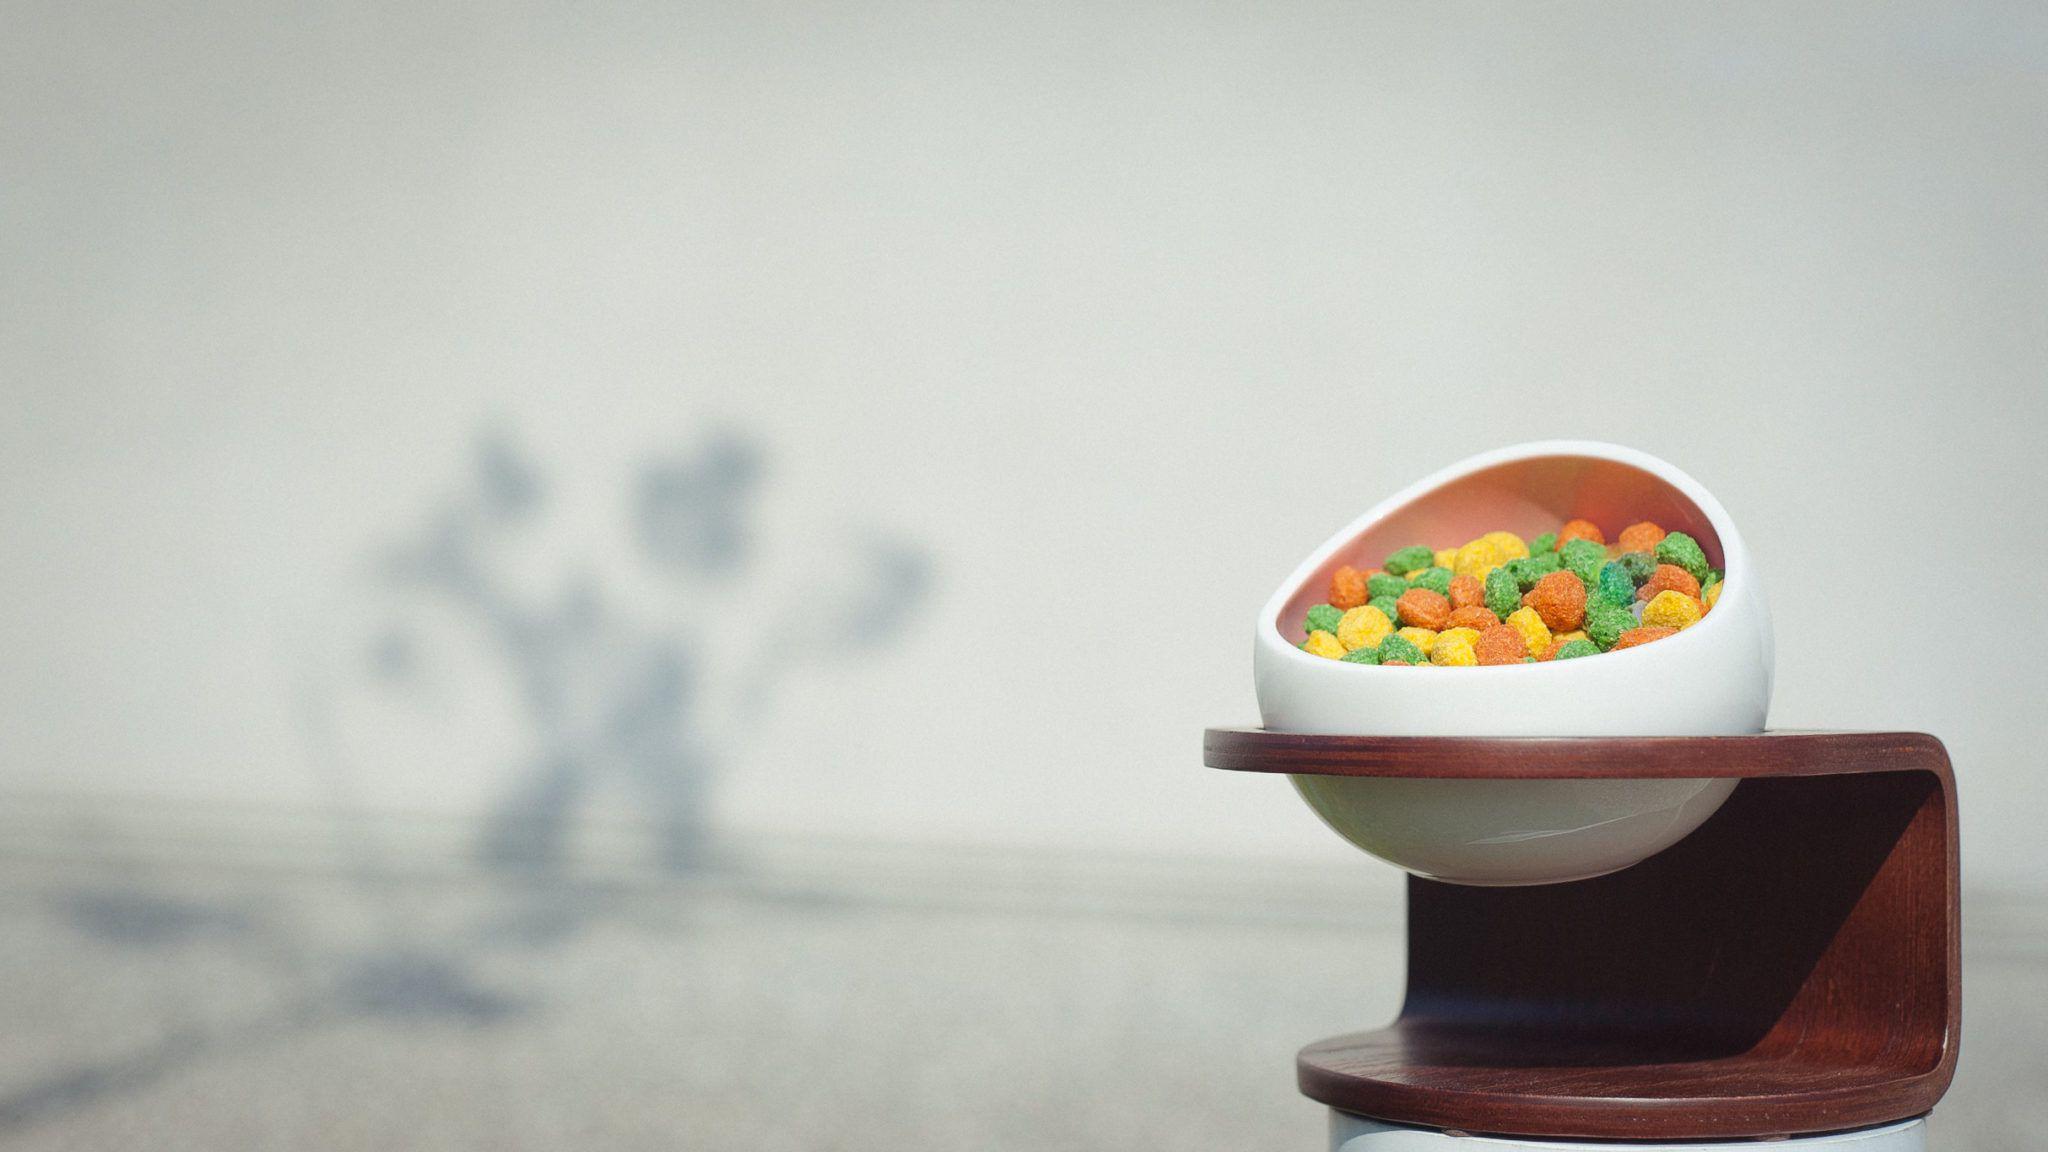 MYZOO 時空膠囊碗 / 寵物碗